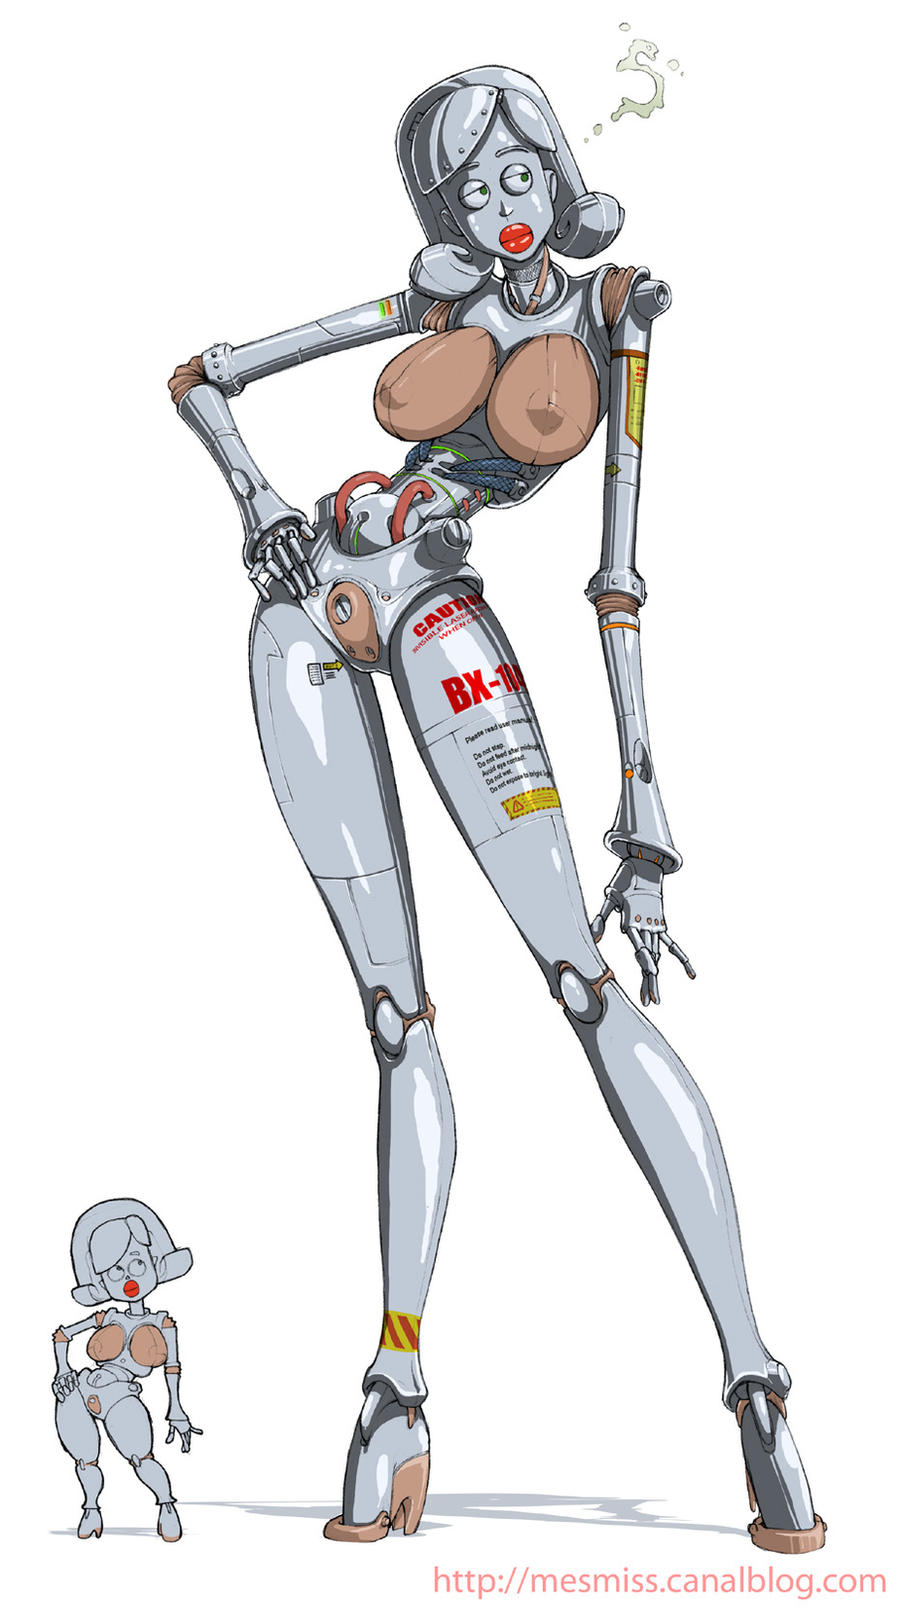 The Cyborg by DavidRaphet